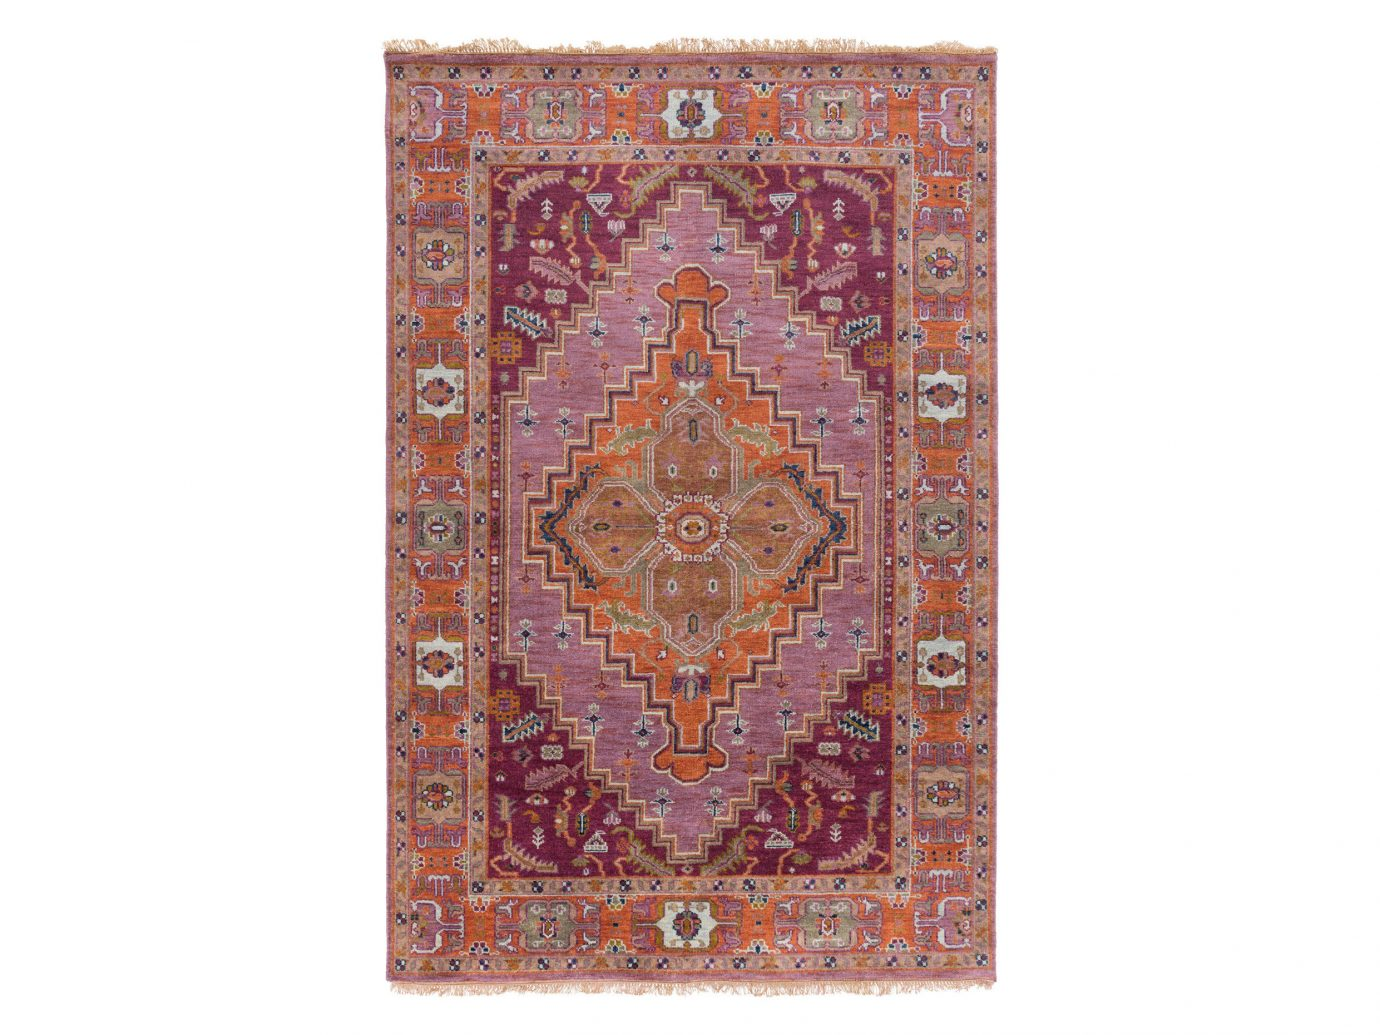 Amsterdam Style + Design The Netherlands Travel Shop furniture rug flooring carpet paisley